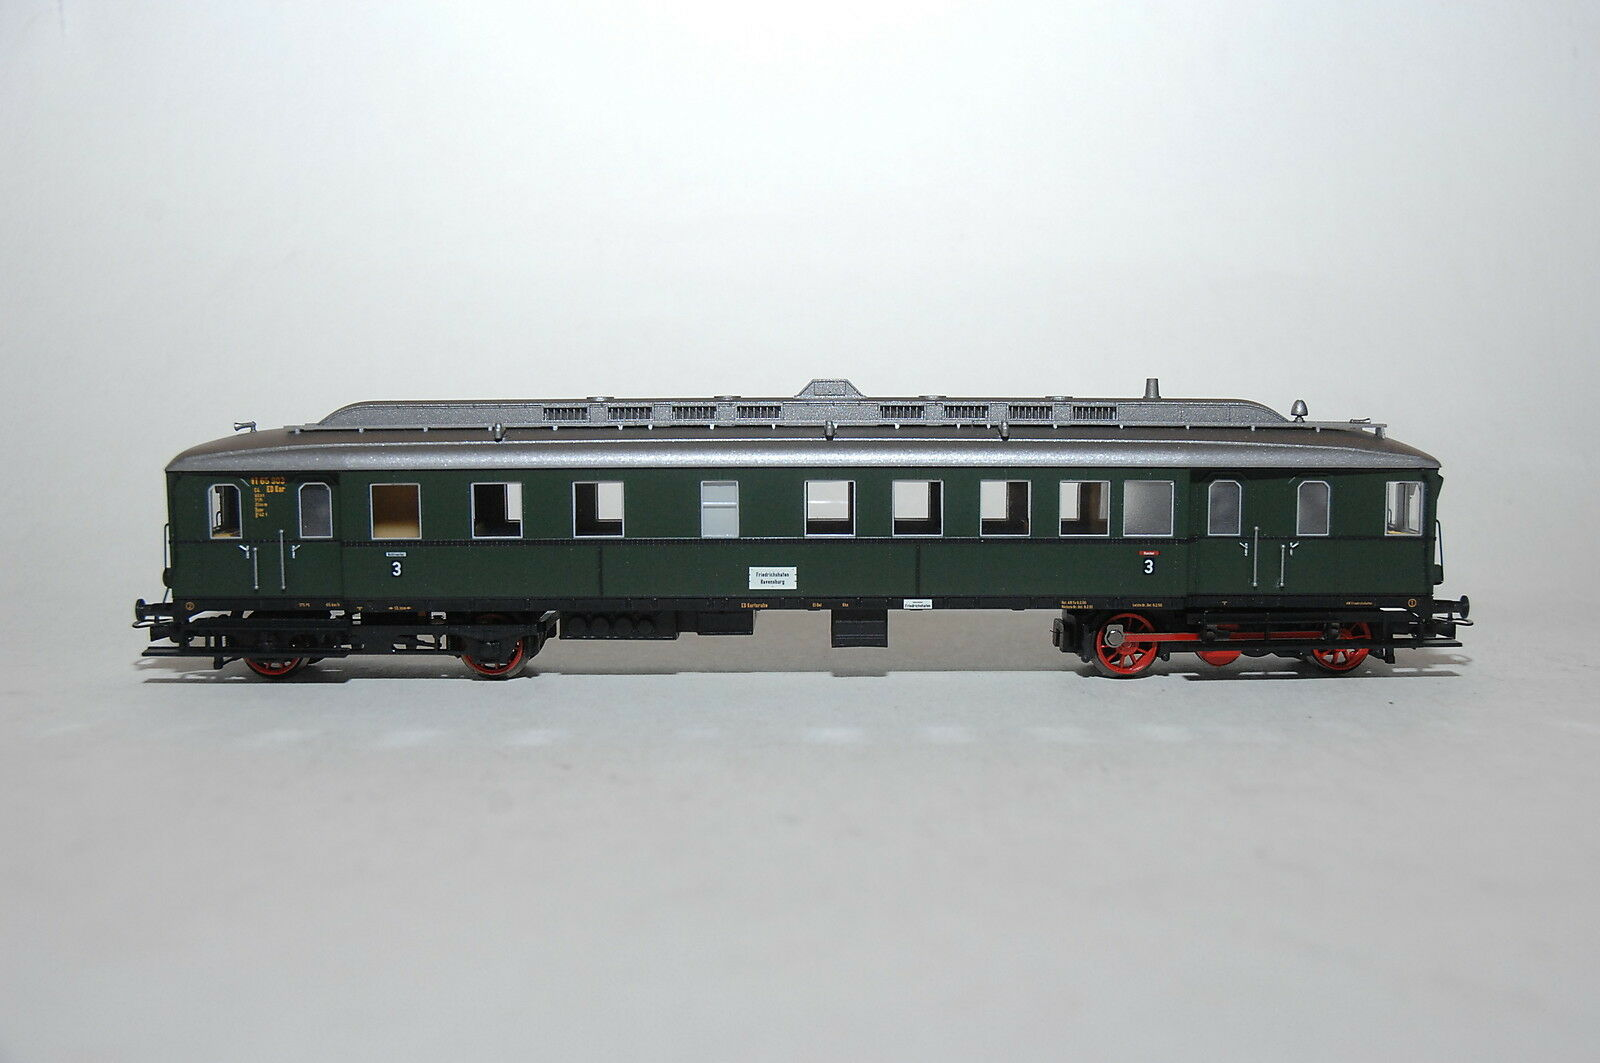 Liliput 133022 Unidad De Tren Diésel VT 65 903 DB ep.iii NUEVO